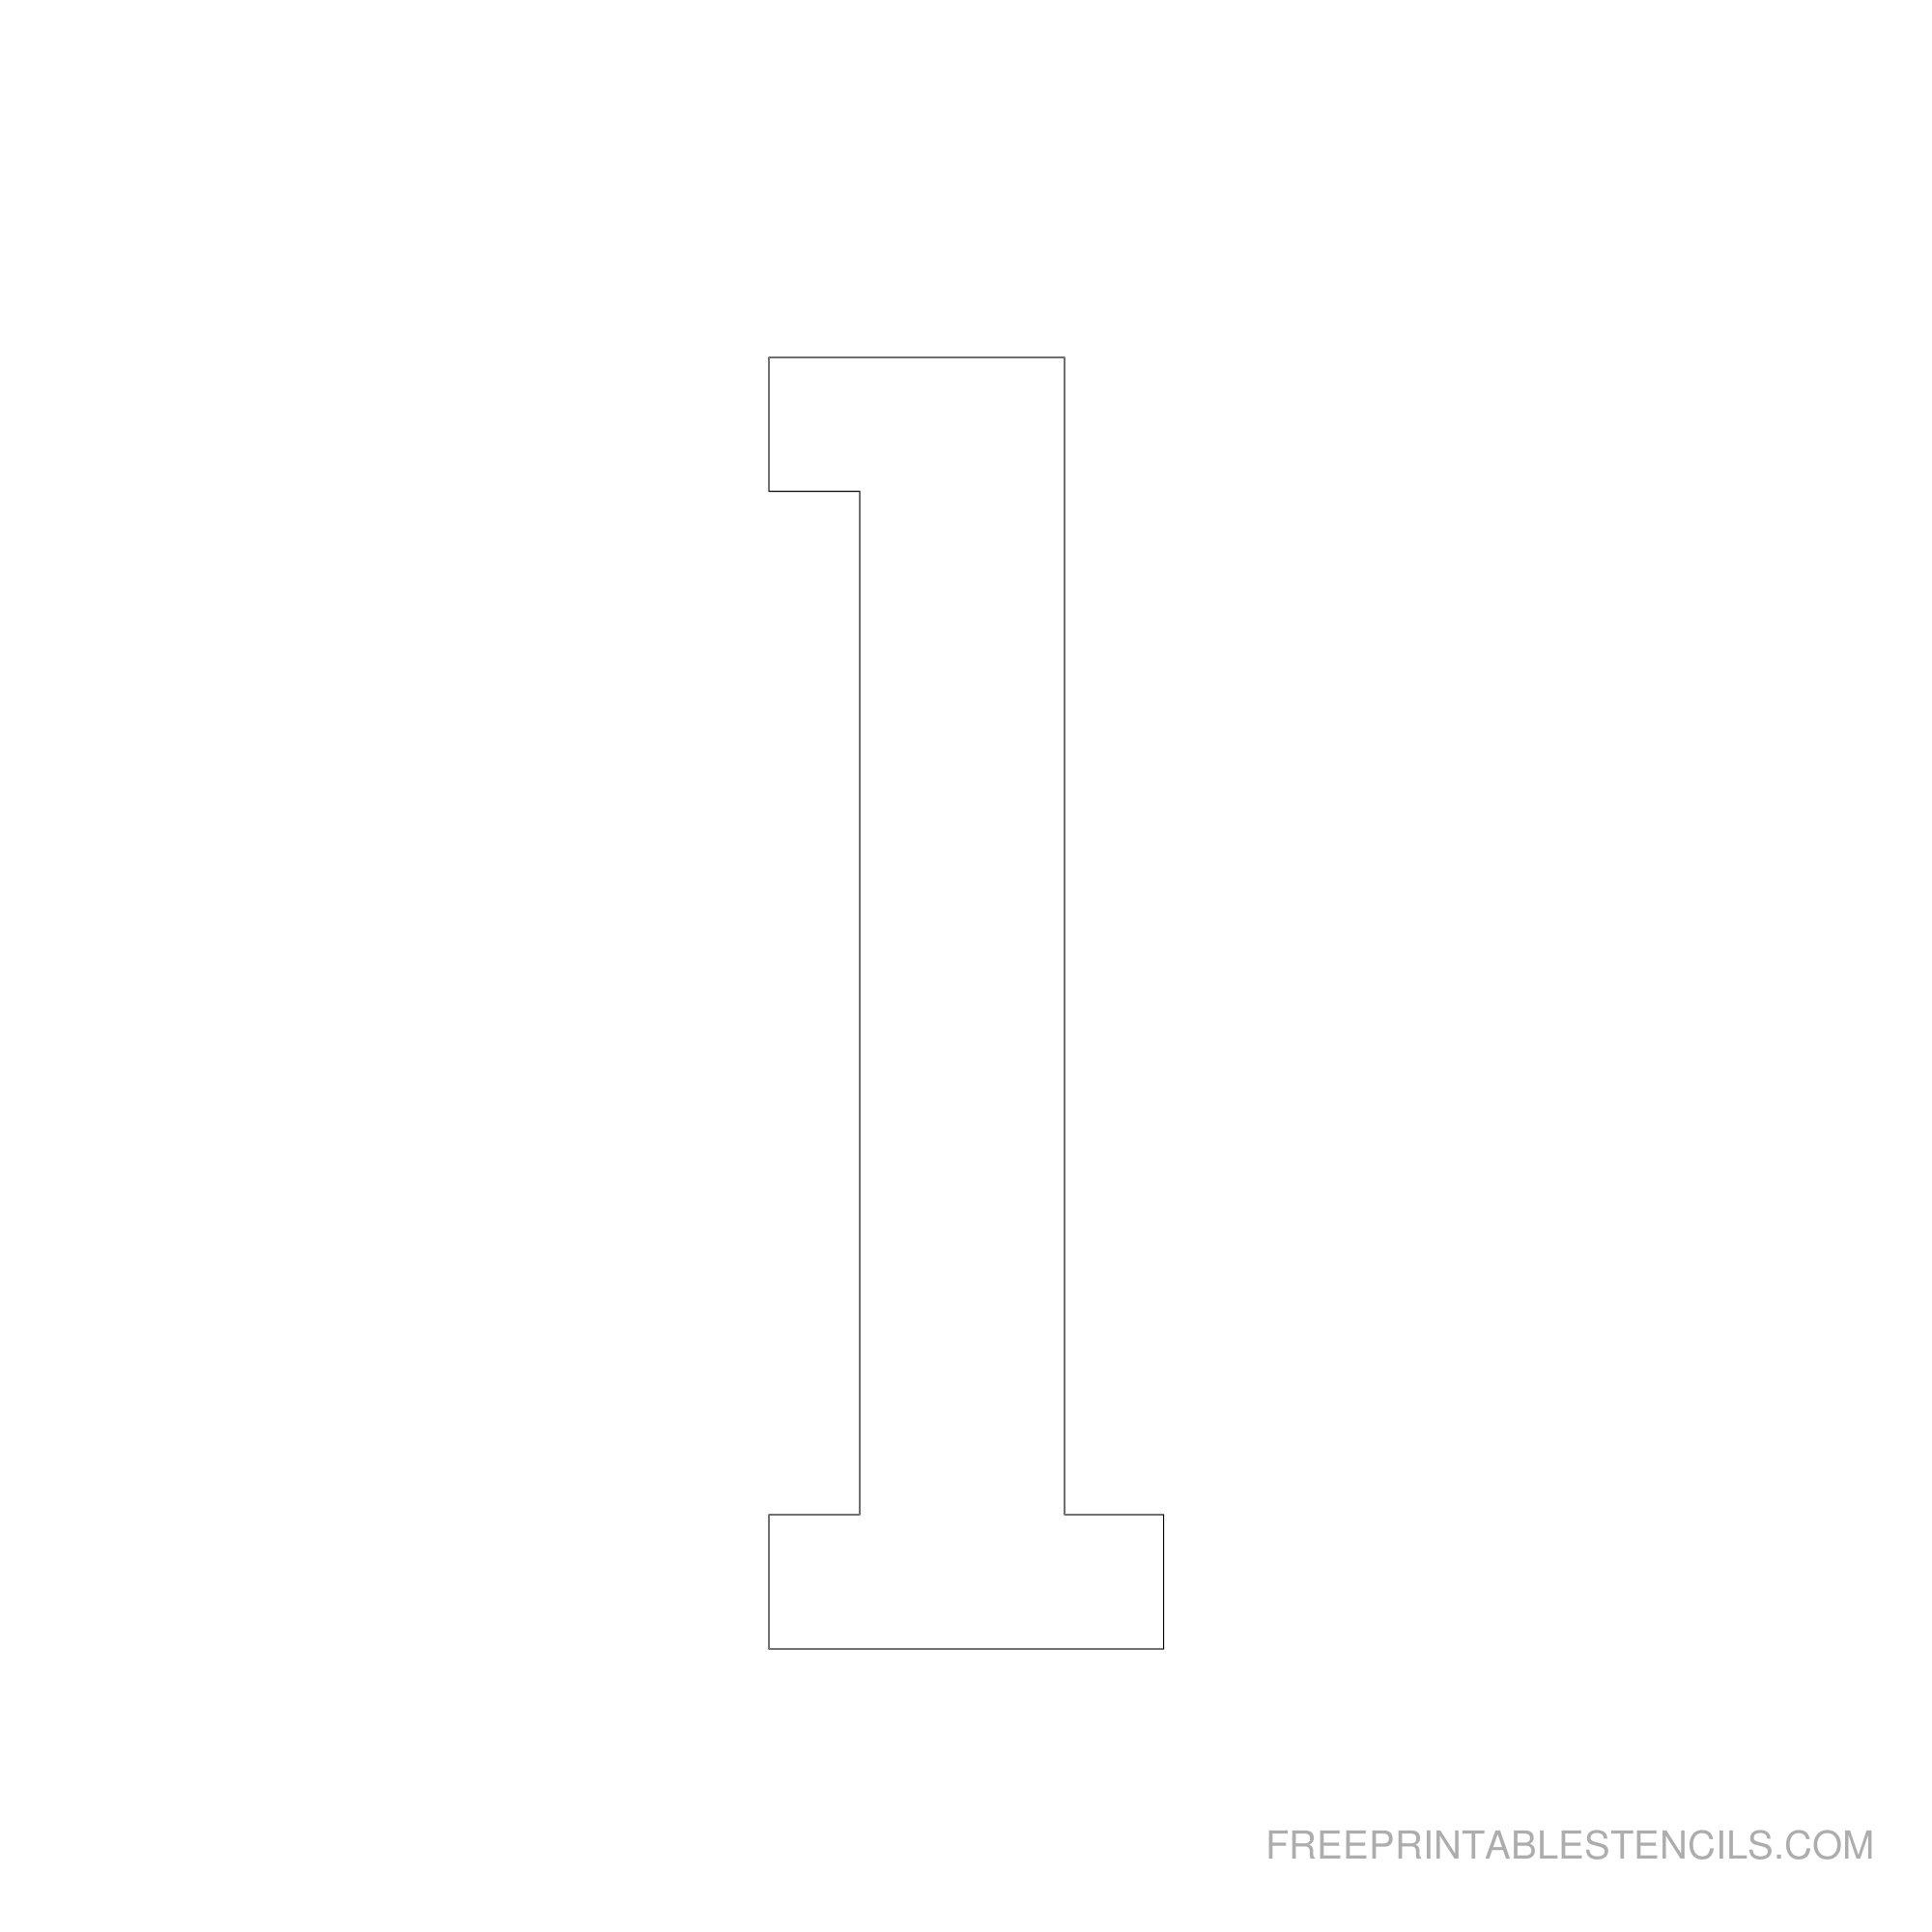 Printable 6 Inch Number Stencils 1-10 | Free Printable Stencils - Free Printable Fancy Number Stencils